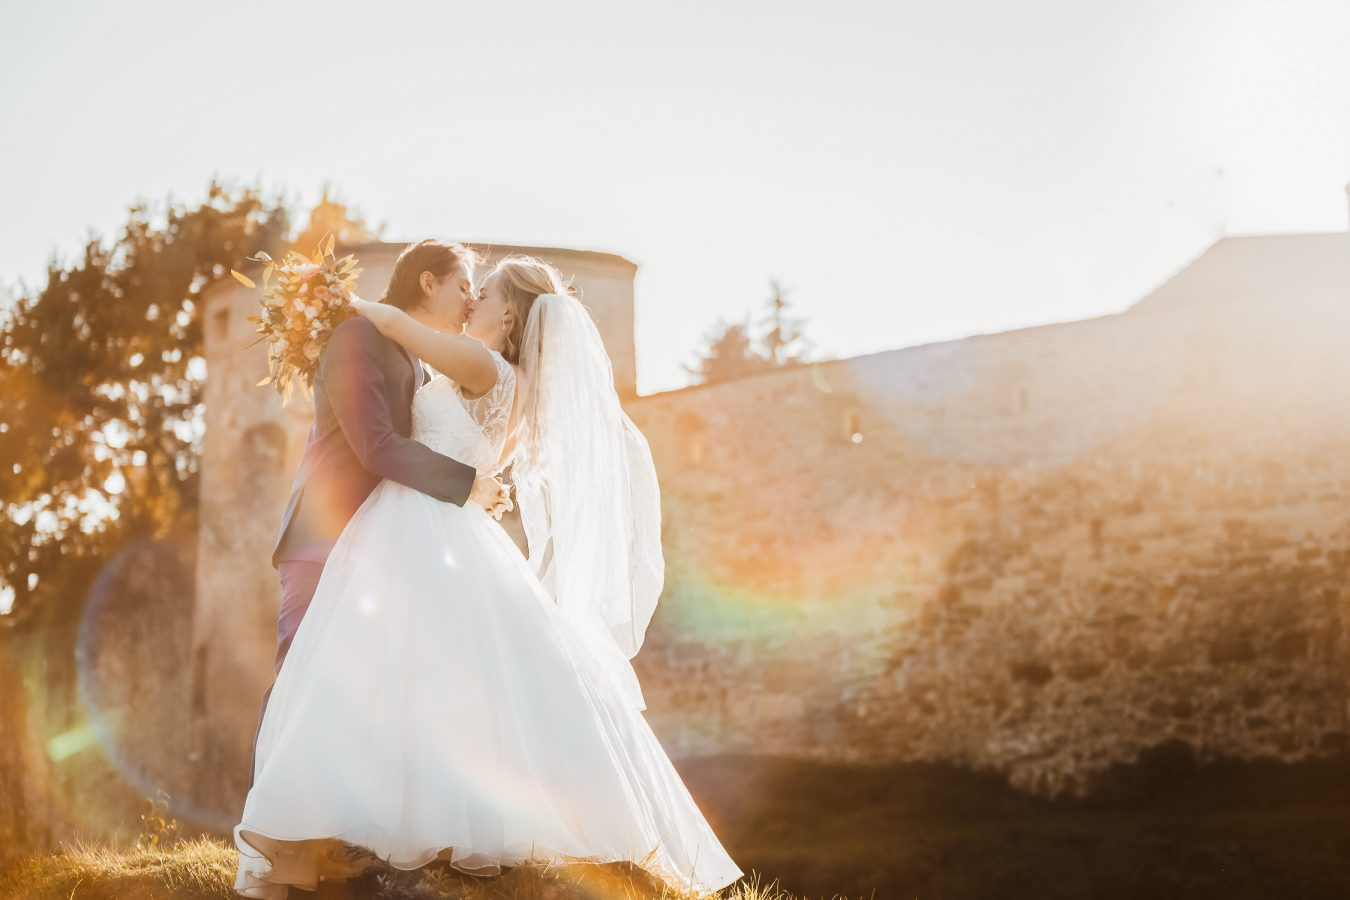 Destination wedding photographers Peter and Ivana Miller